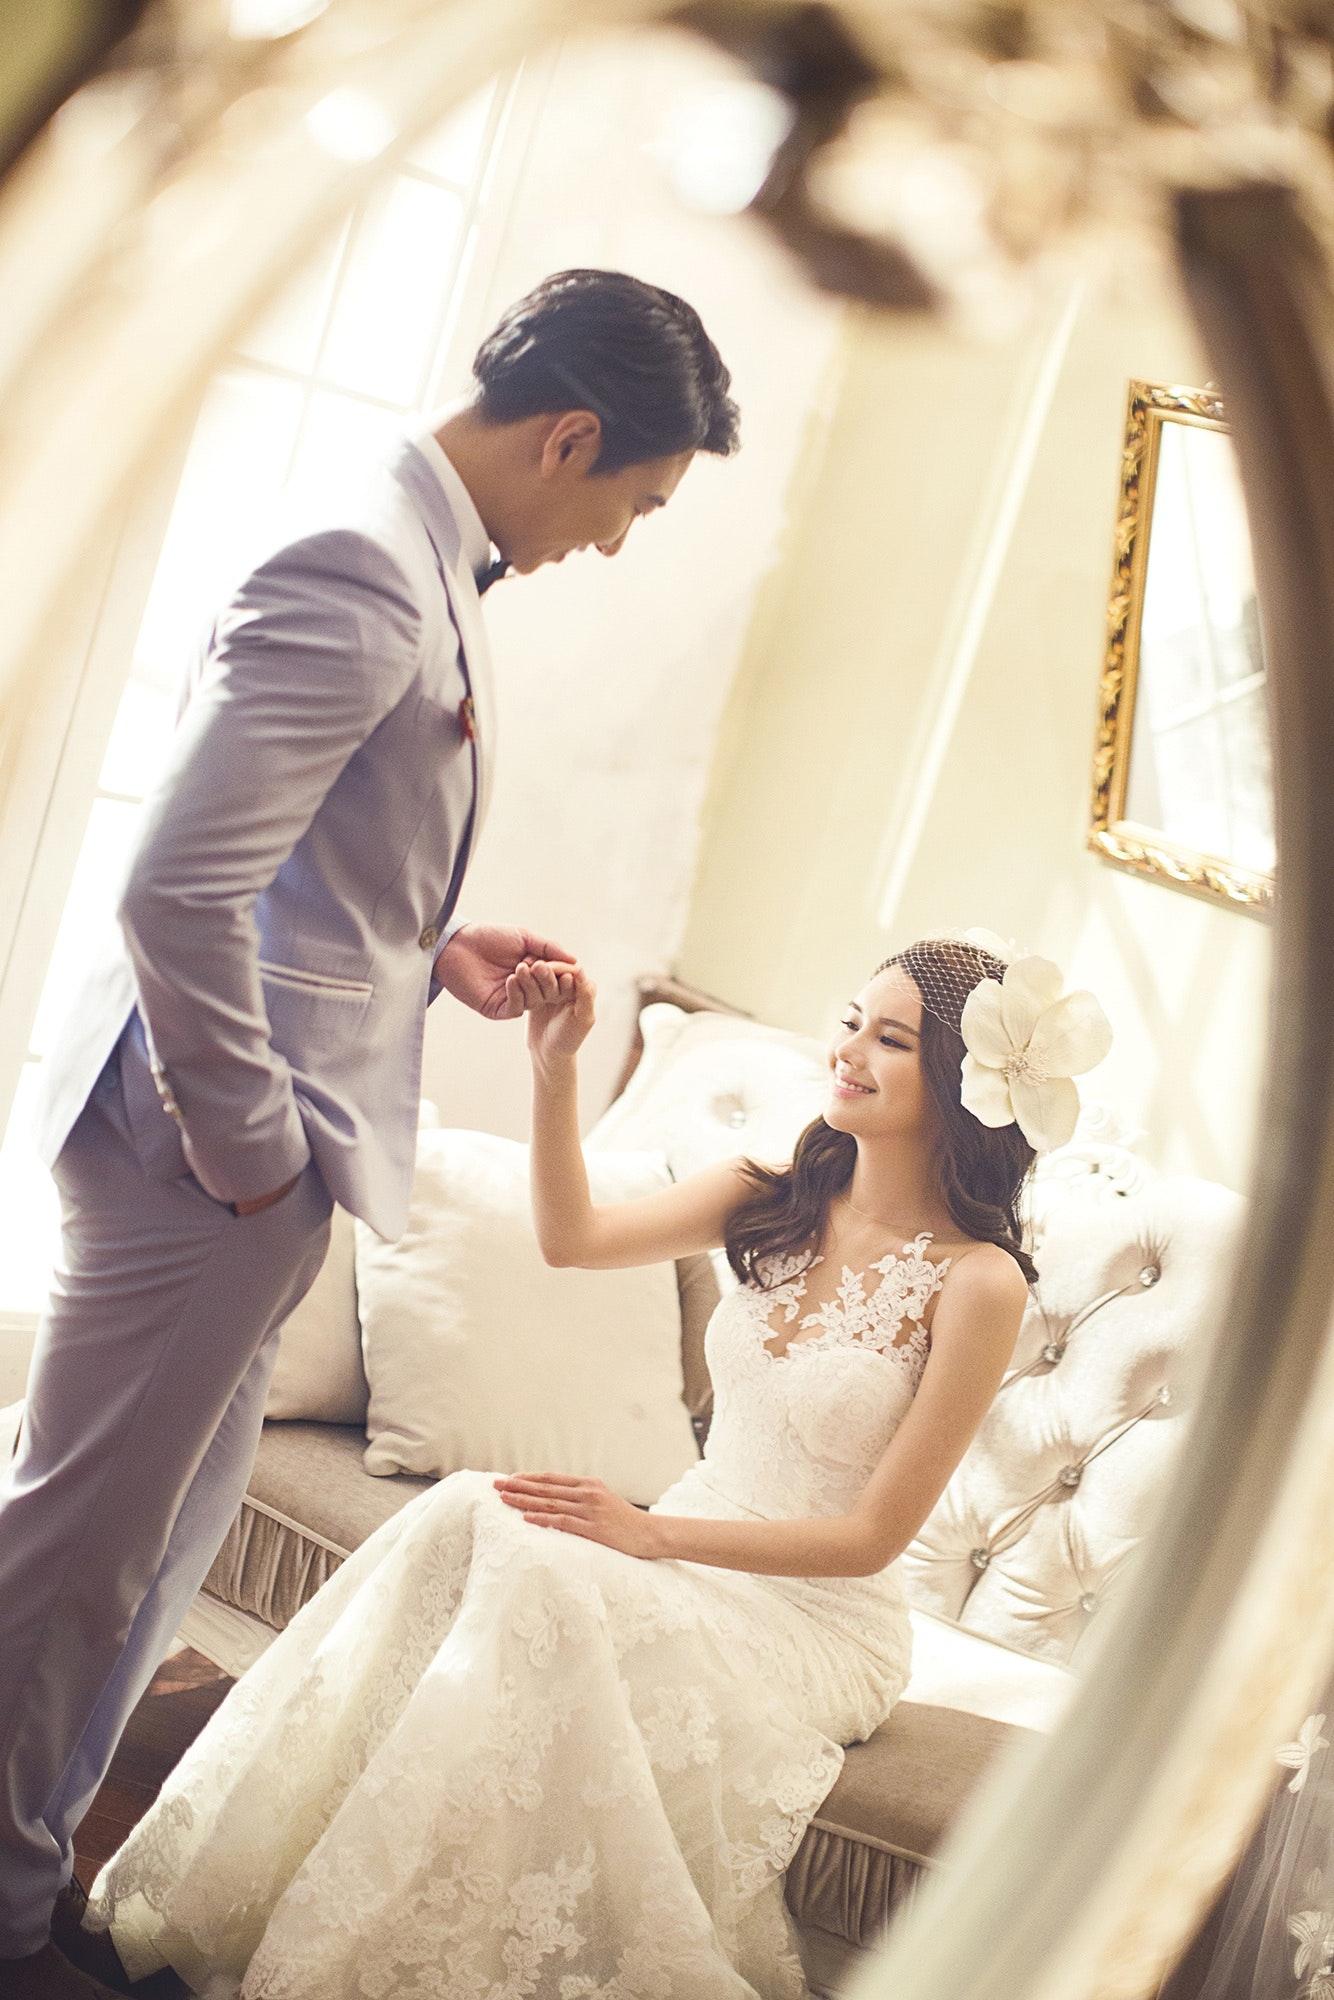 adult-bridal-bride-265854.jpg